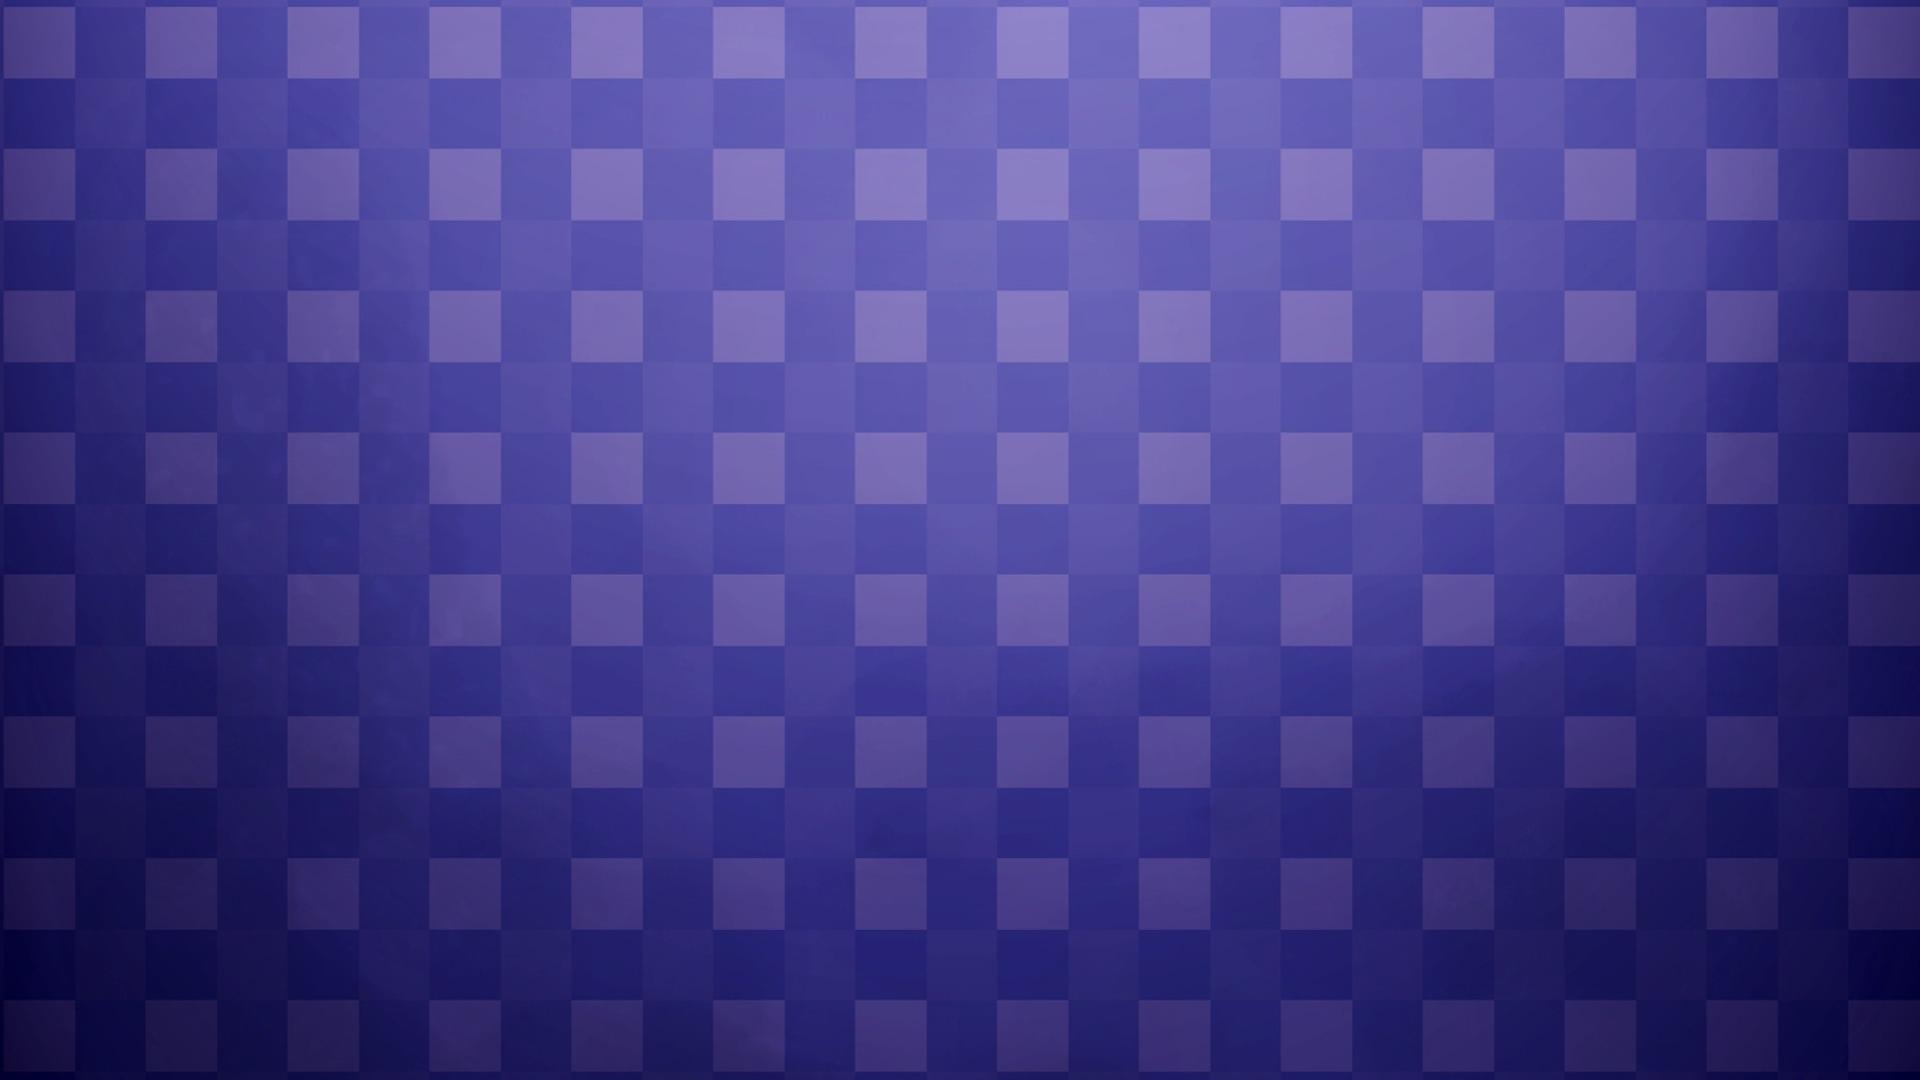 Hd Wallpaper Computer Wallpapers Desktop Backgrounds